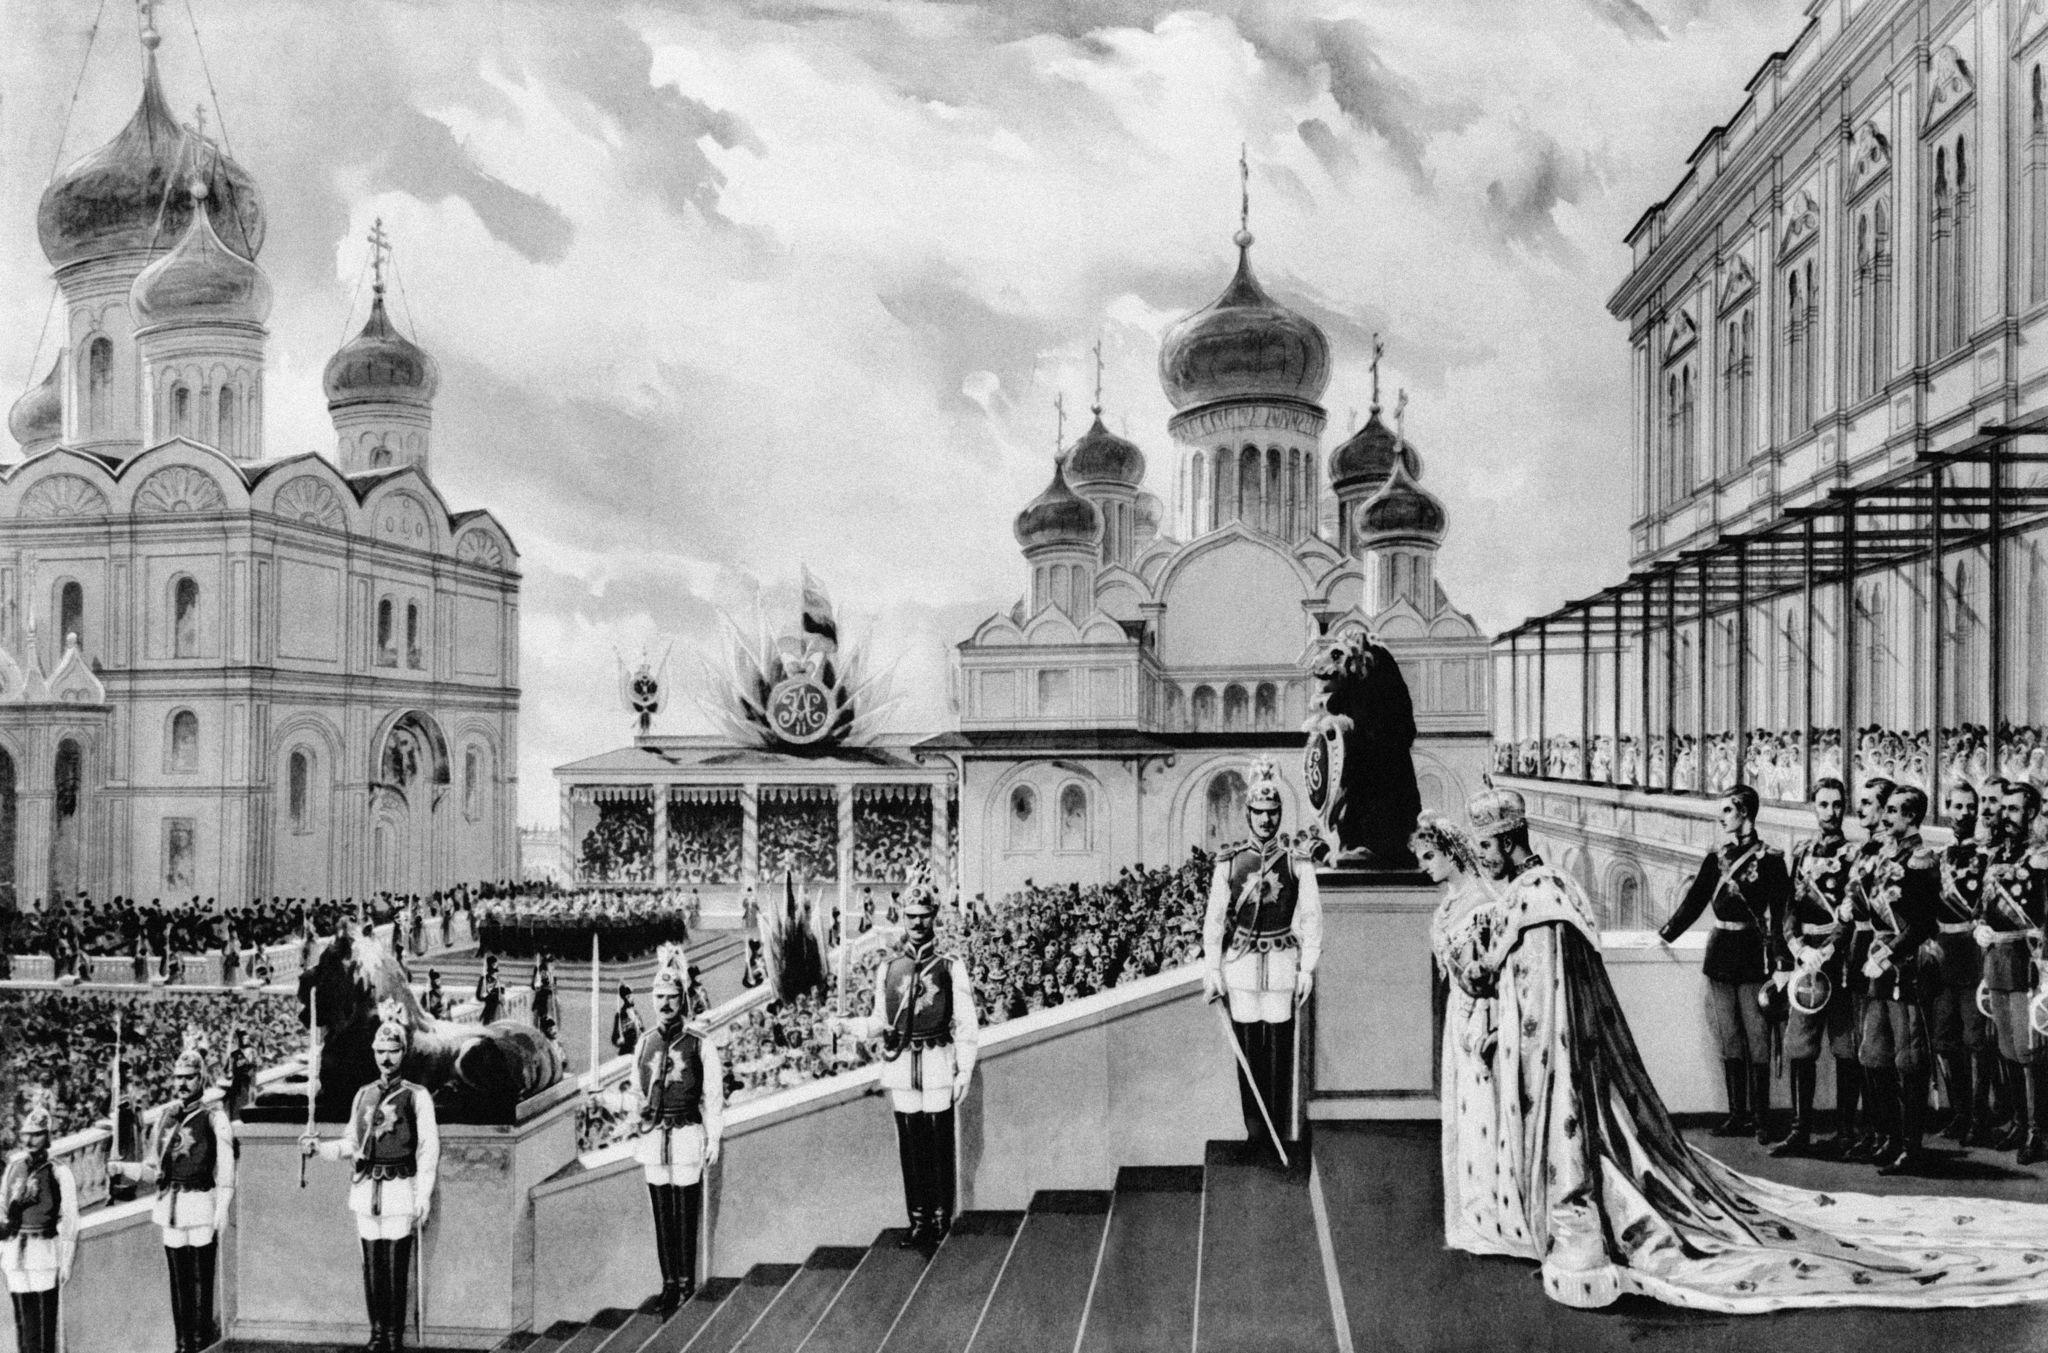 Царь Николай II и его жена Александра Федоровна в Кремле